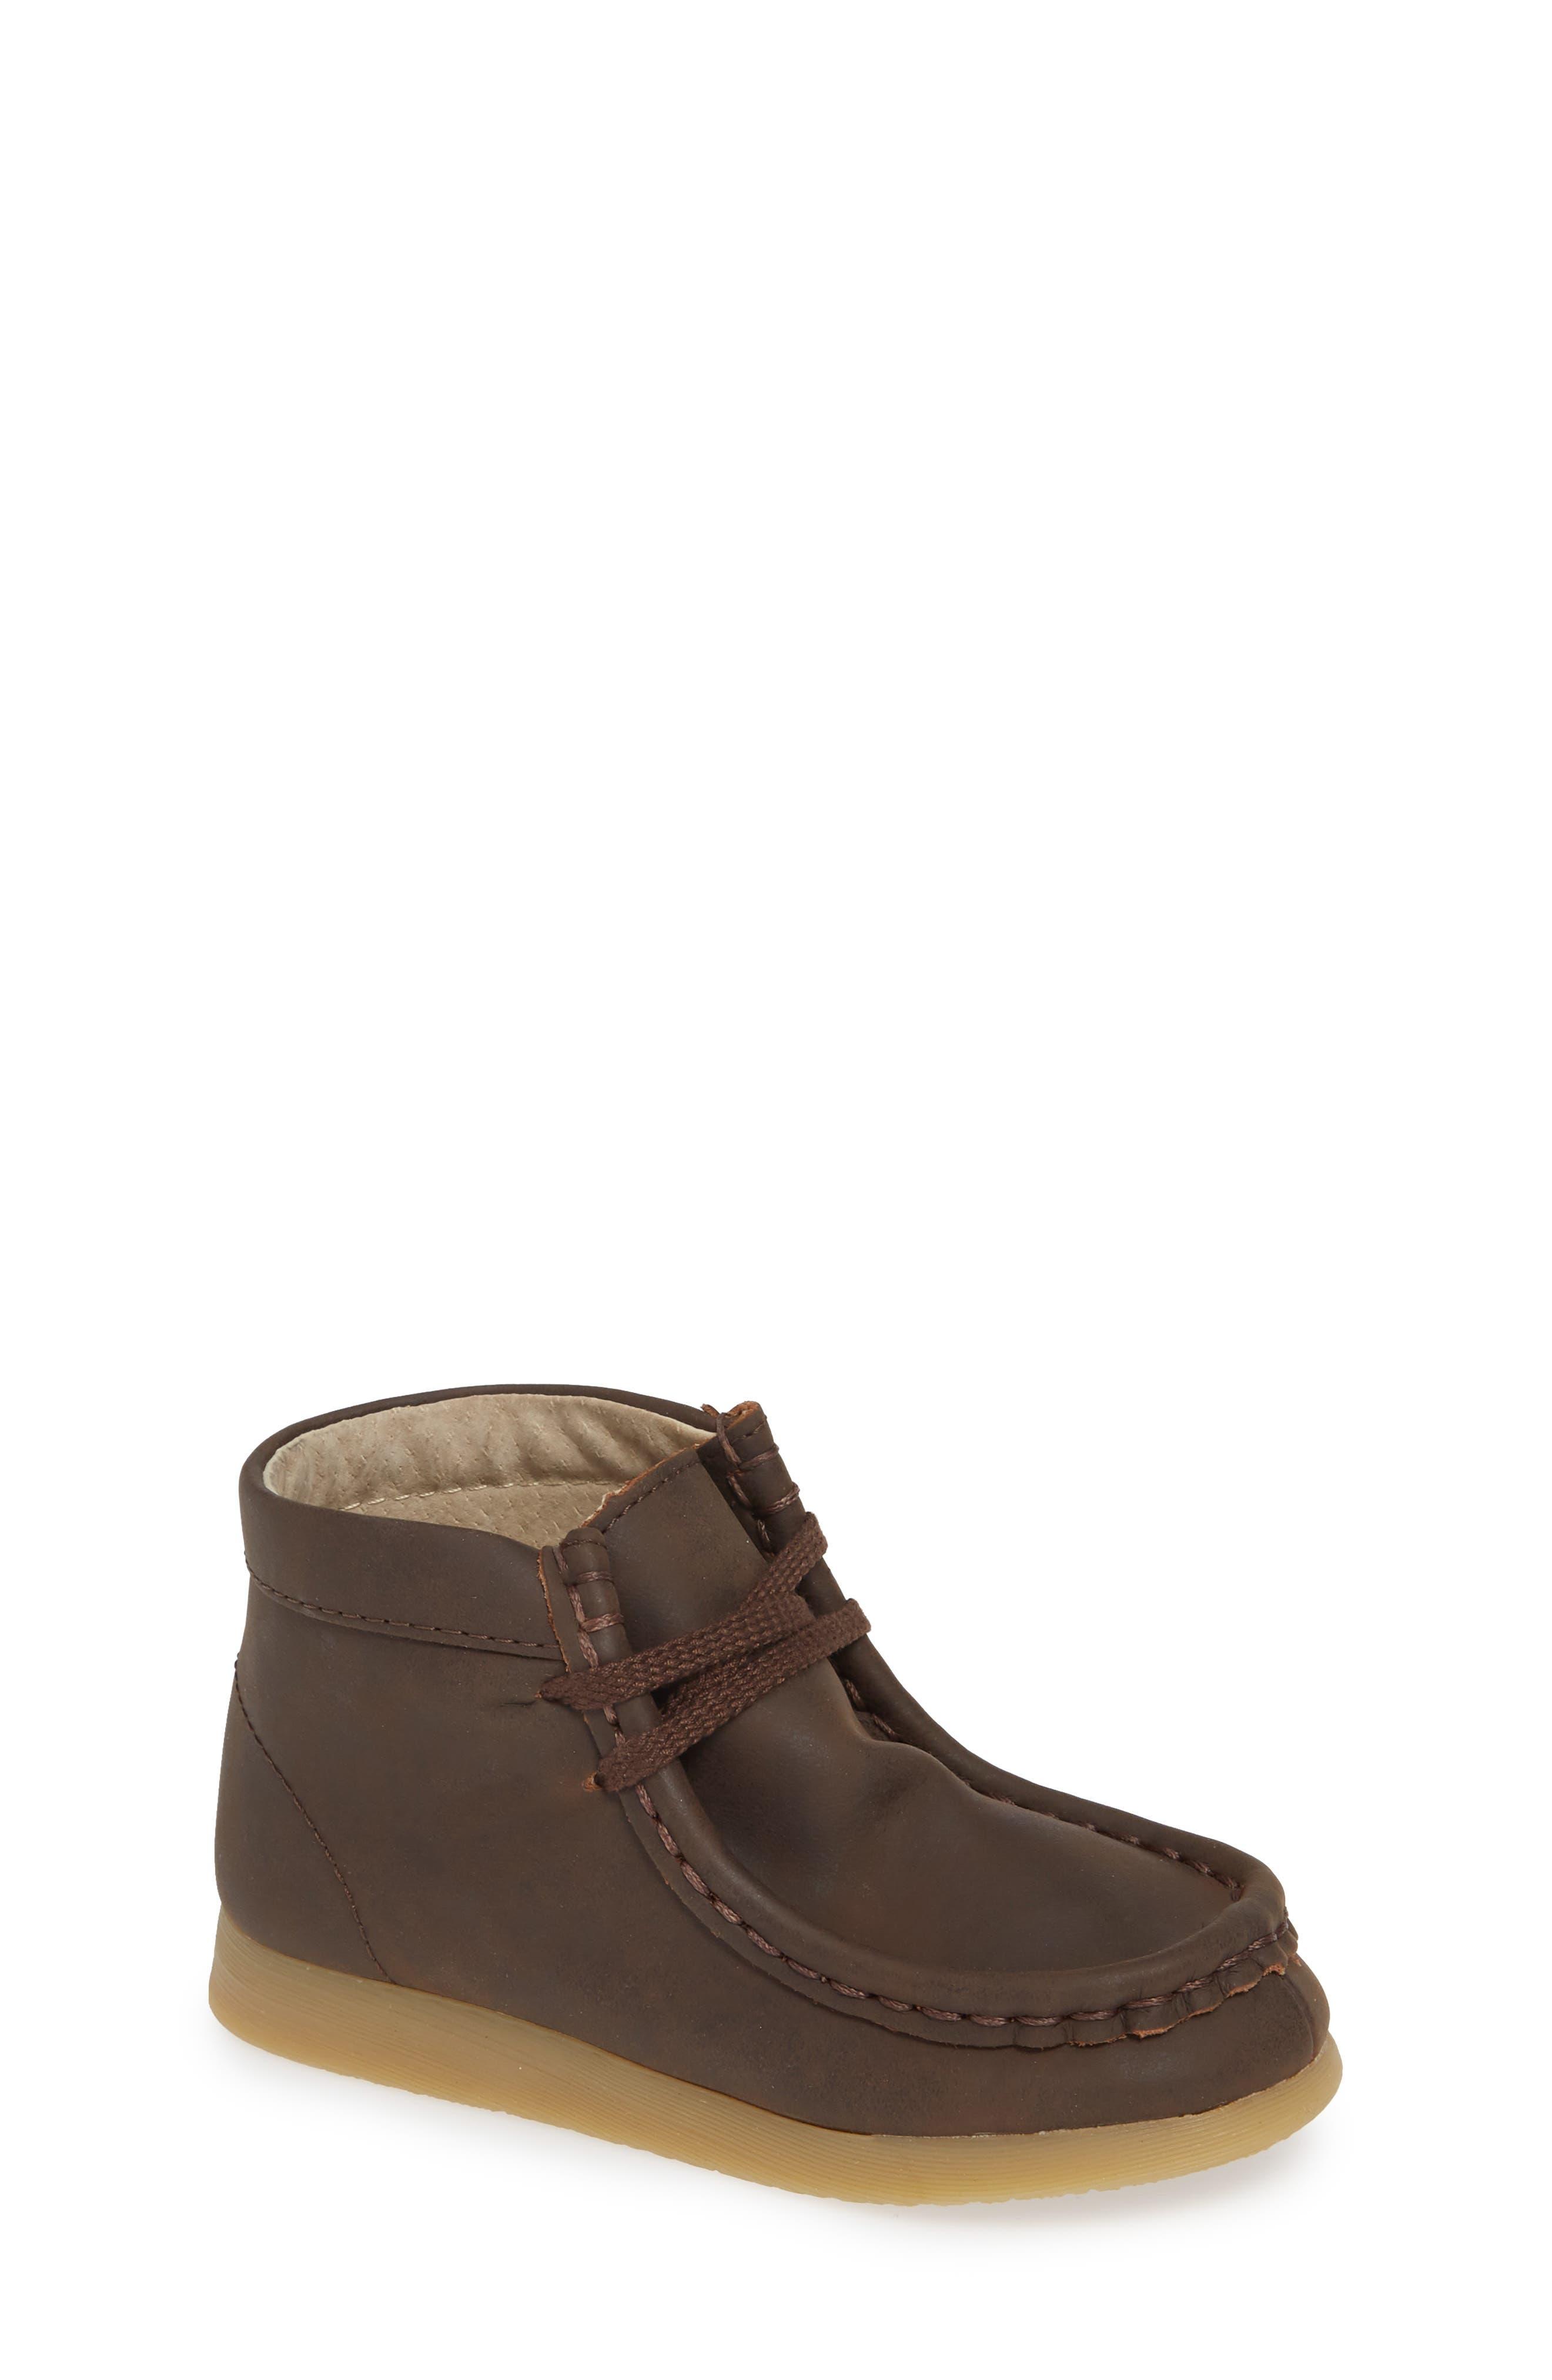 Wally Chukka Boot,                         Main,                         color, BROWN OILED